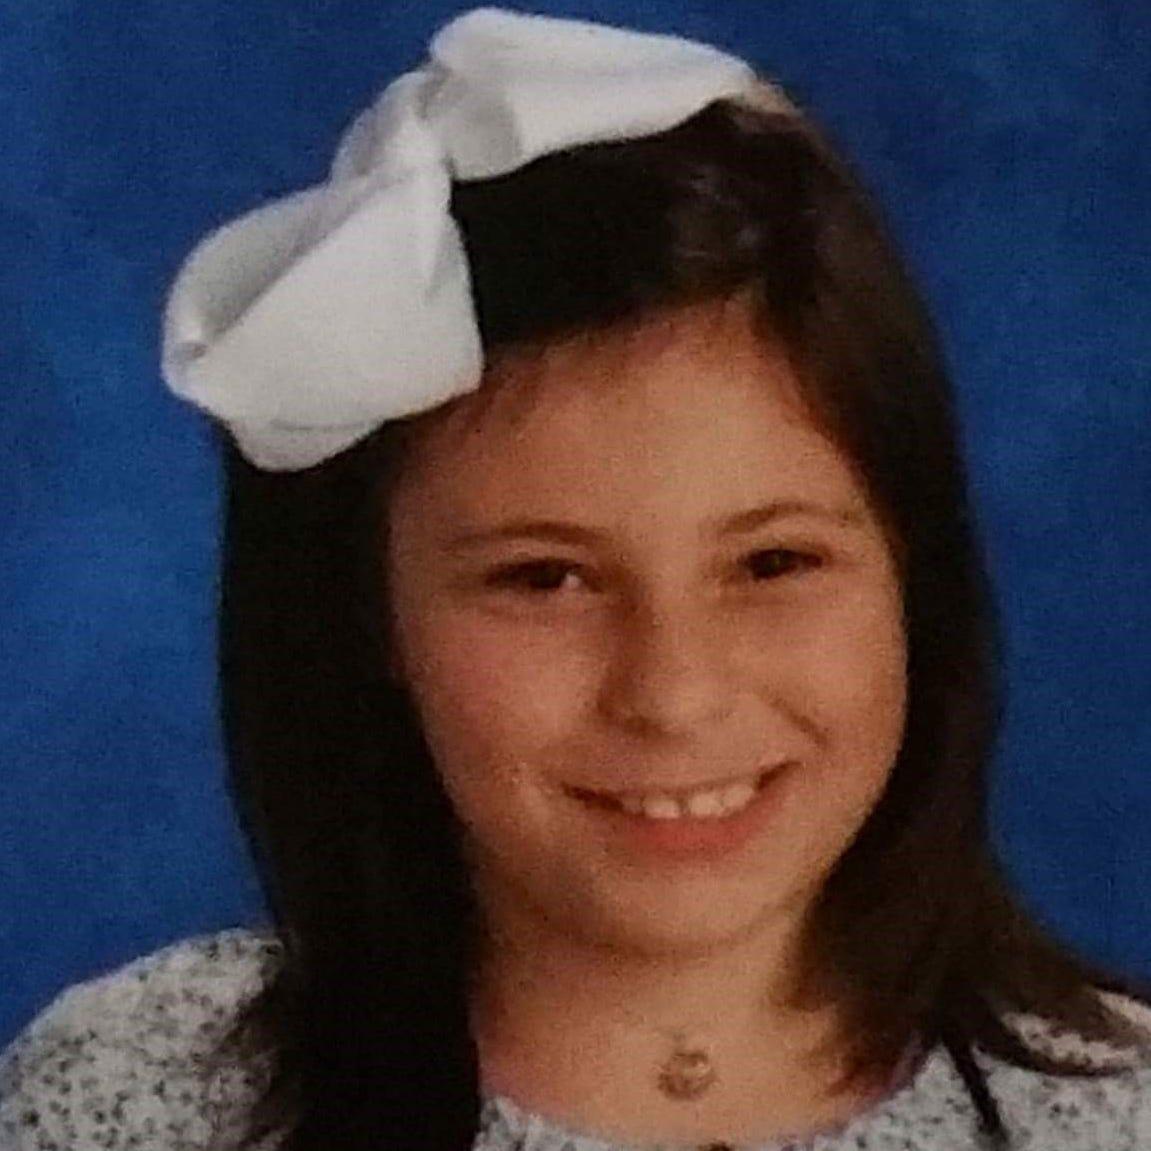 'Horrendous' crash on U.S. 45 kills 10-year-old girl near Winneconne